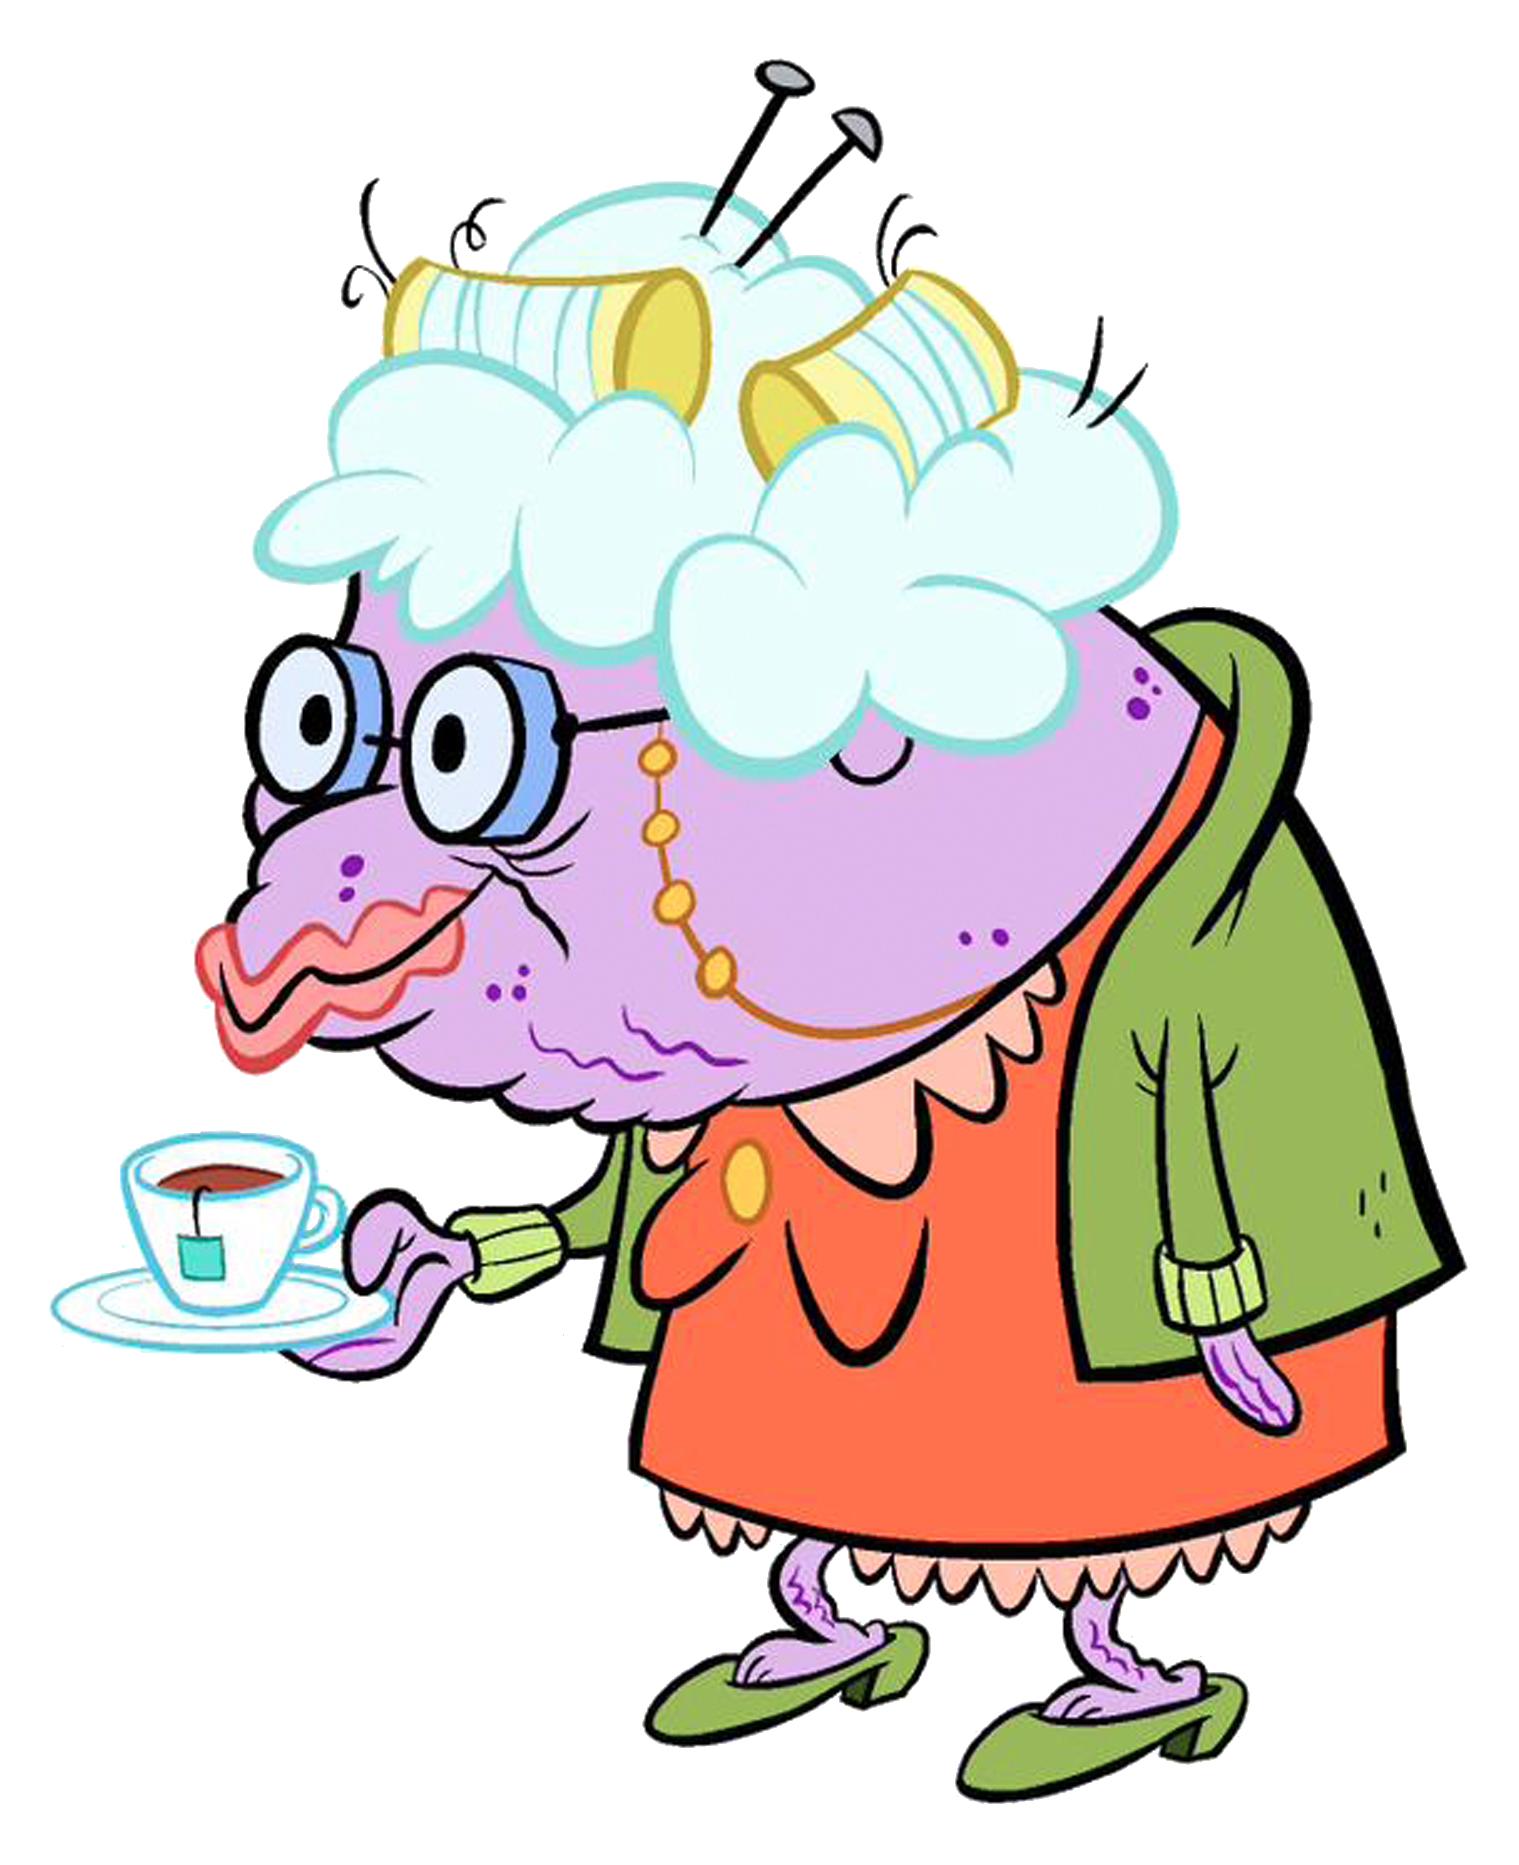 Mad clipart spongebob. Beatrice encyclopedia spongebobia fandom